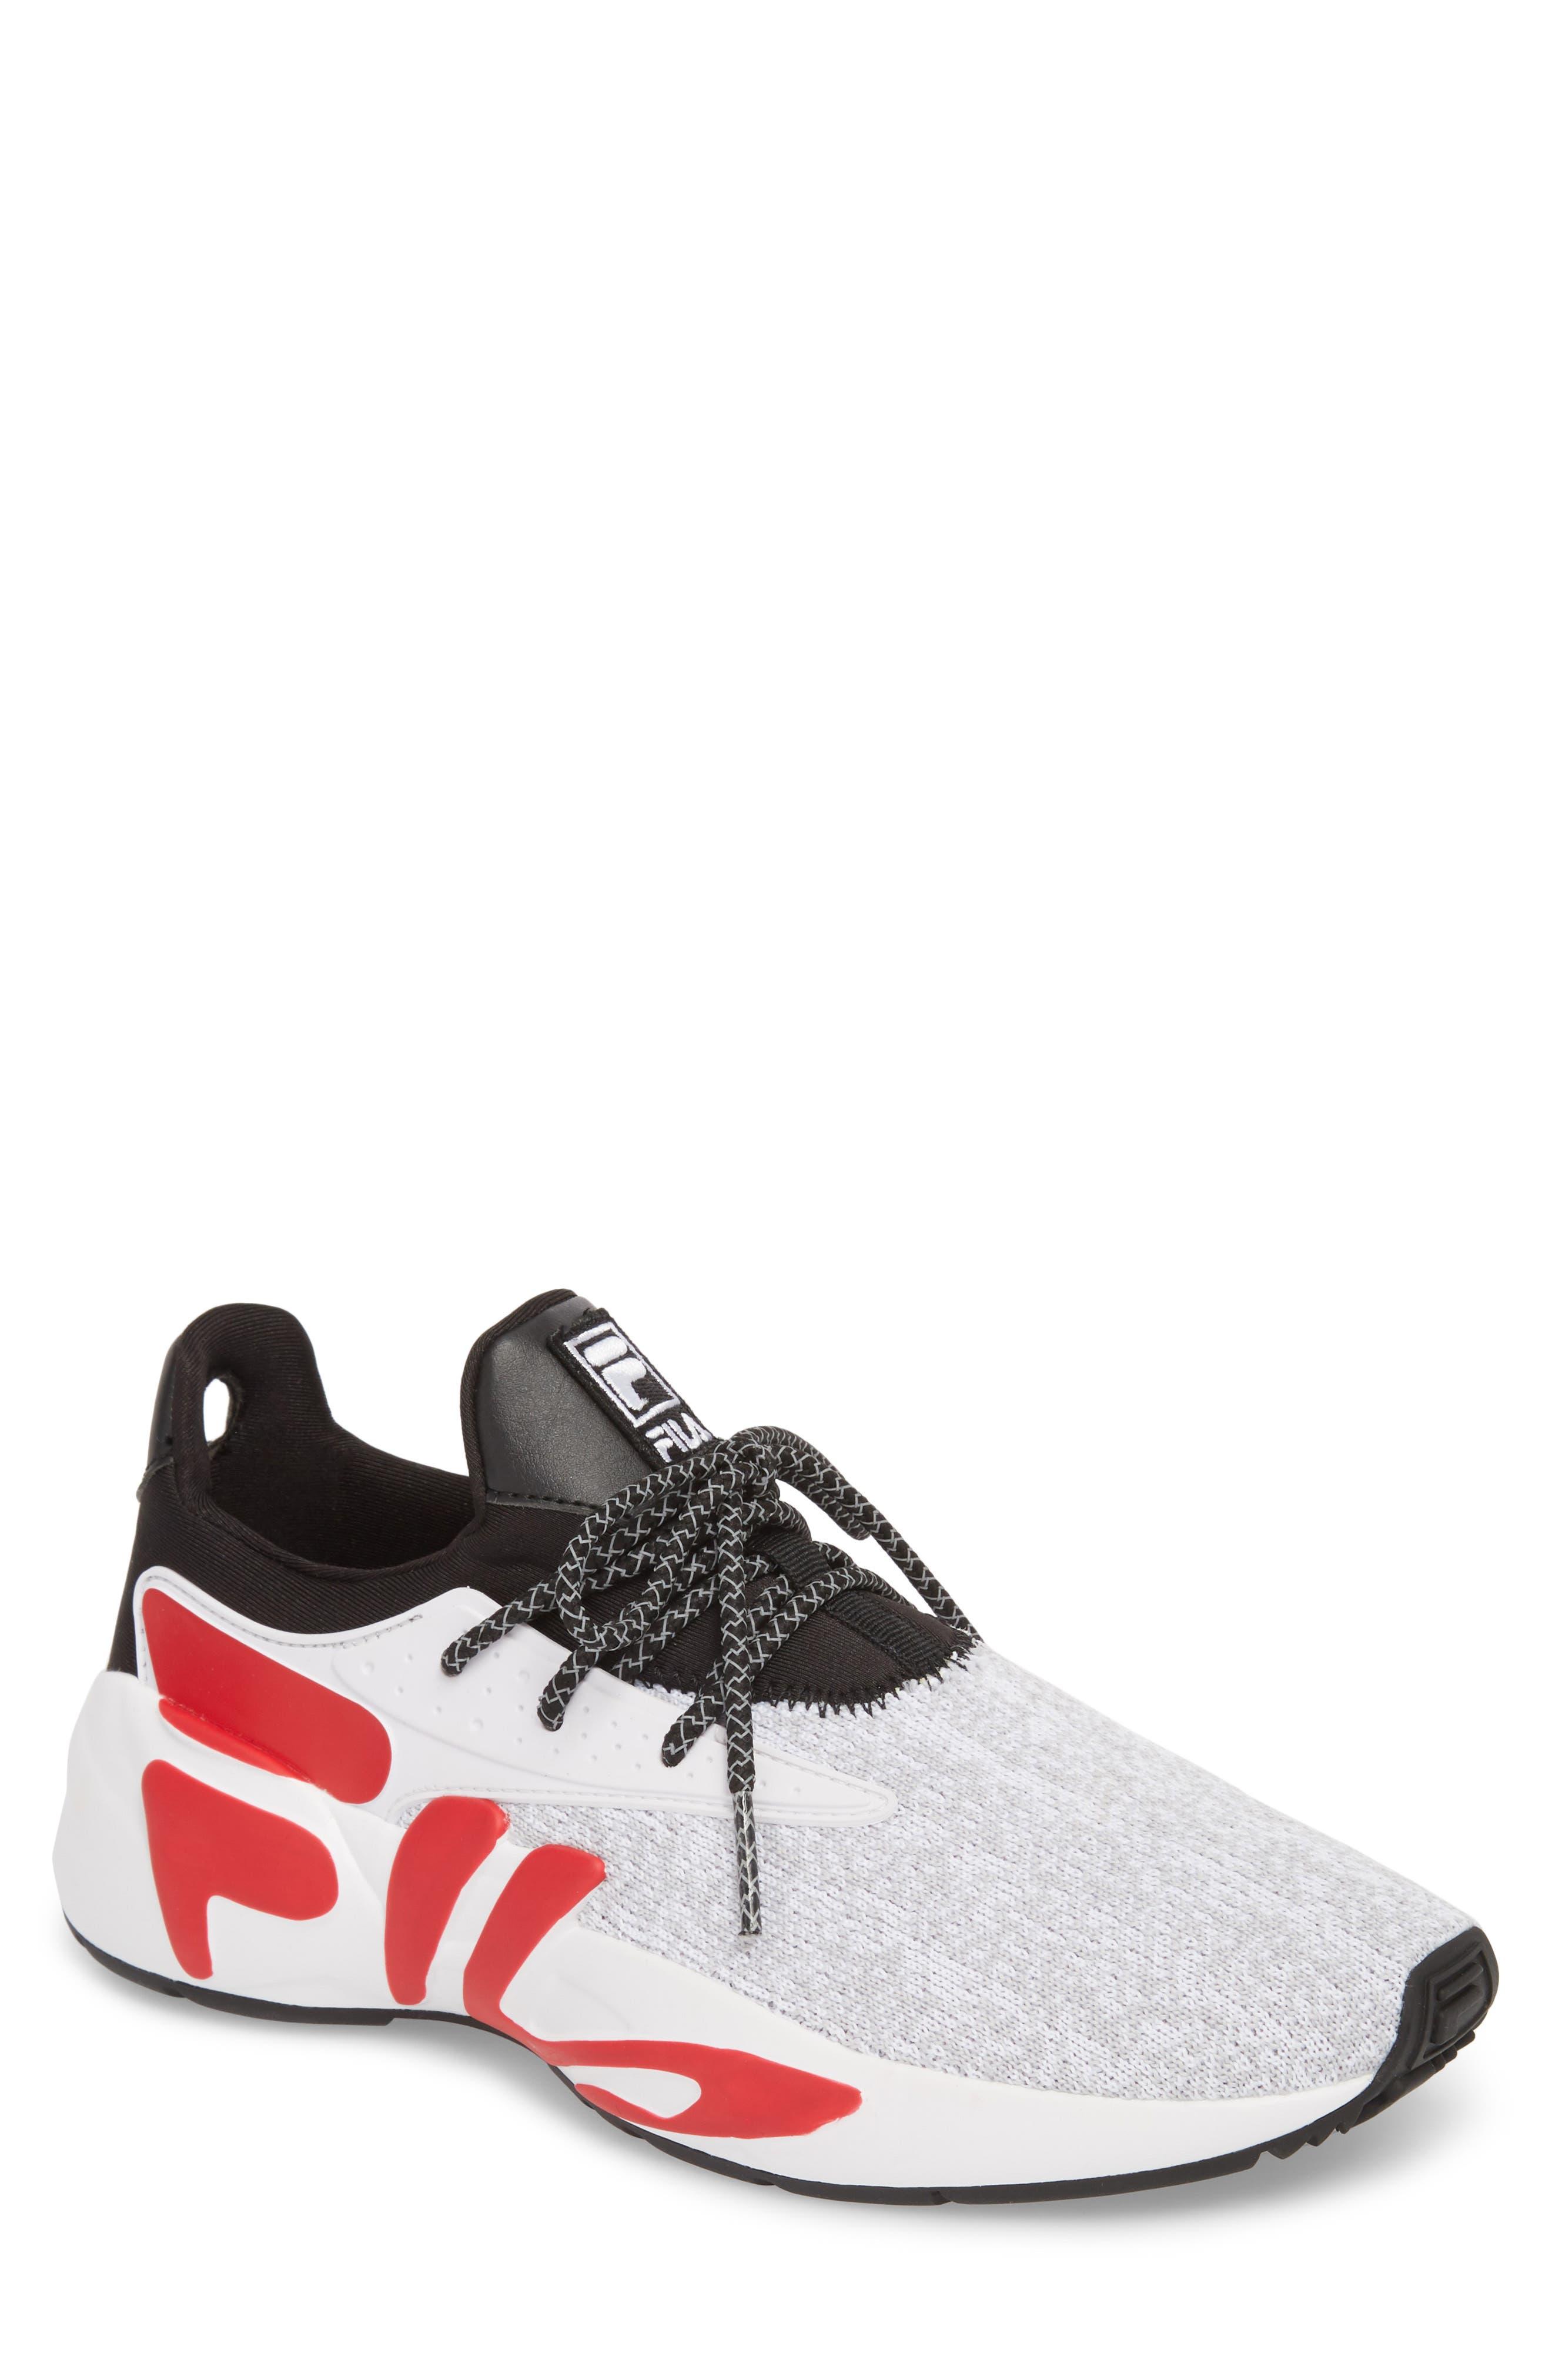 Mindbreaker 2.0 Sneaker,                         Main,                         color, BLACK/ WHITE/ RED